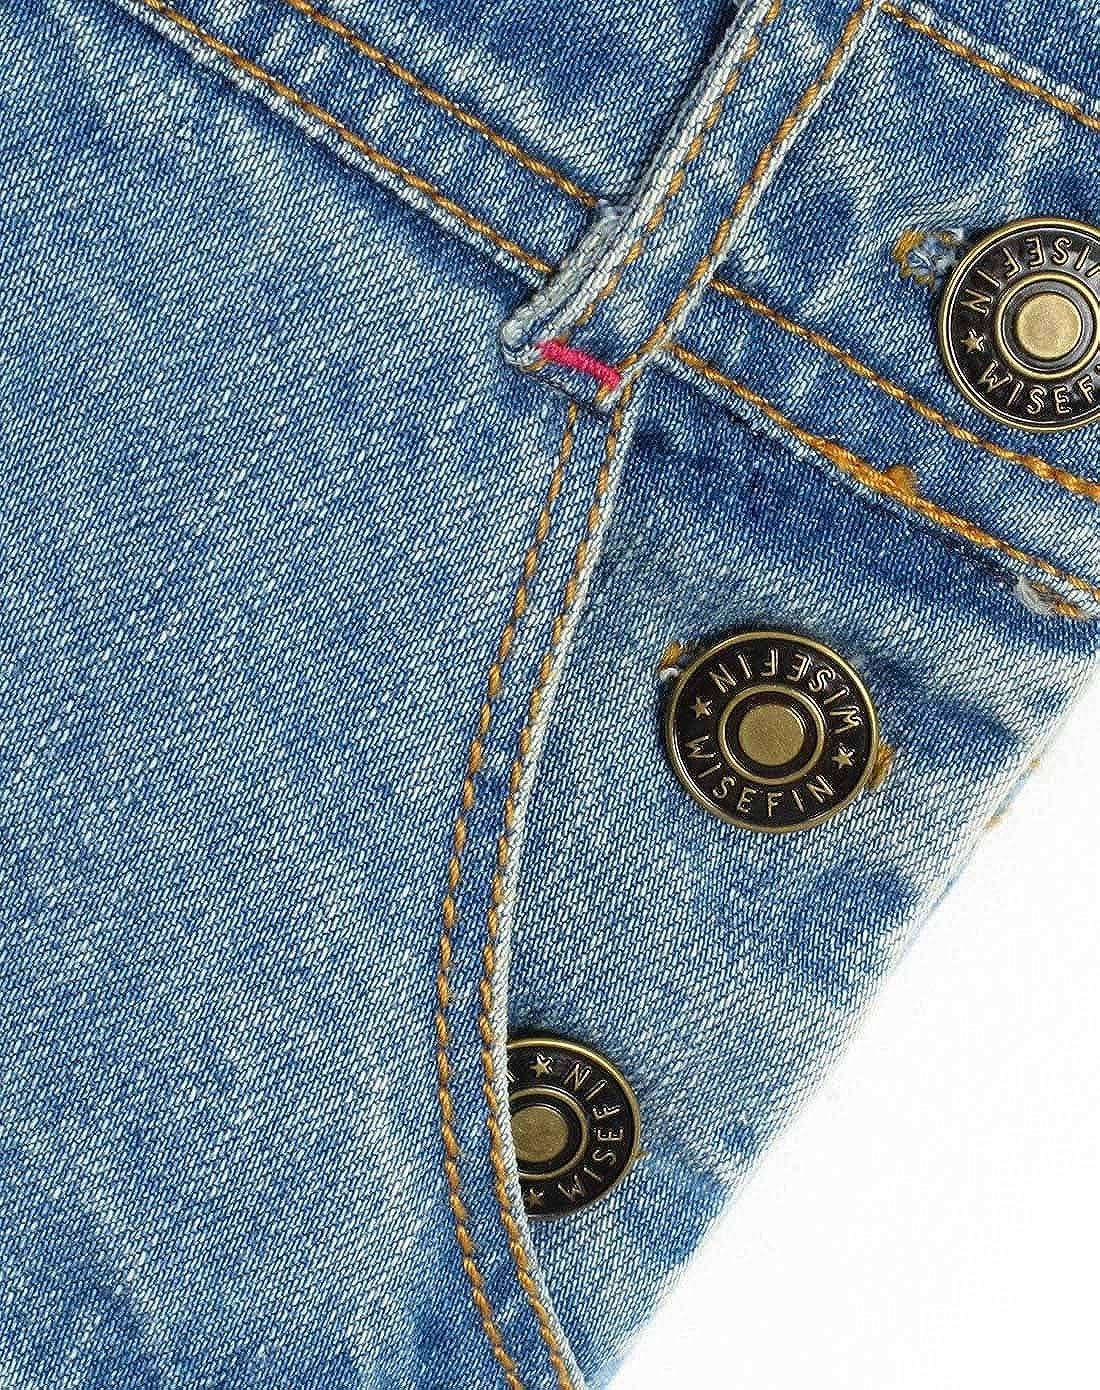 wisefin Girls Fashion Casual Strap Denim Shorts for Bigger Kids 5-17 Years